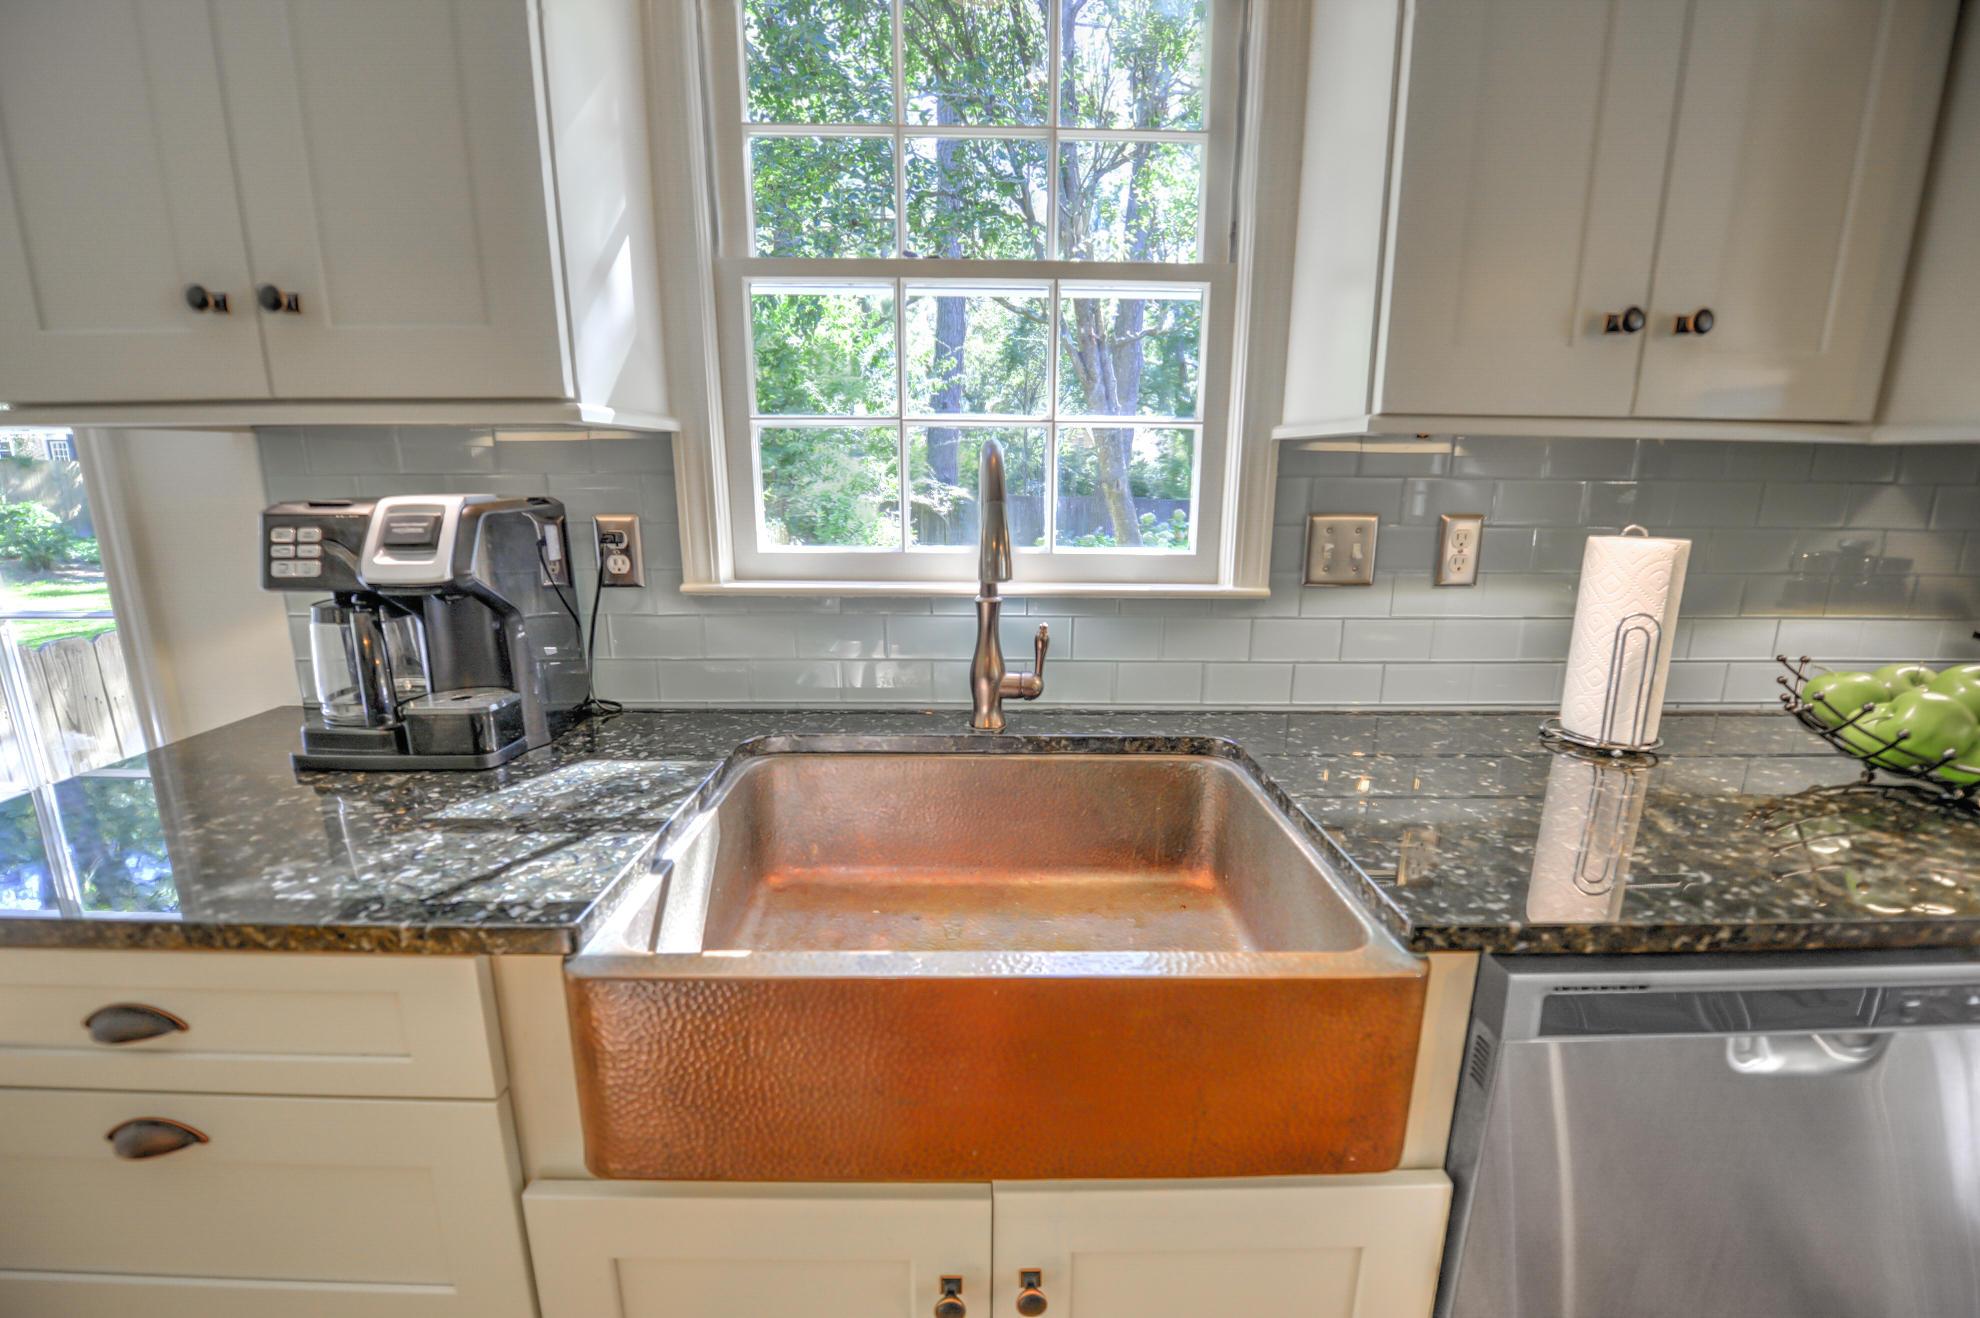 Shemwood II Homes For Sale - 1017 Jack Snipe, Mount Pleasant, SC - 16